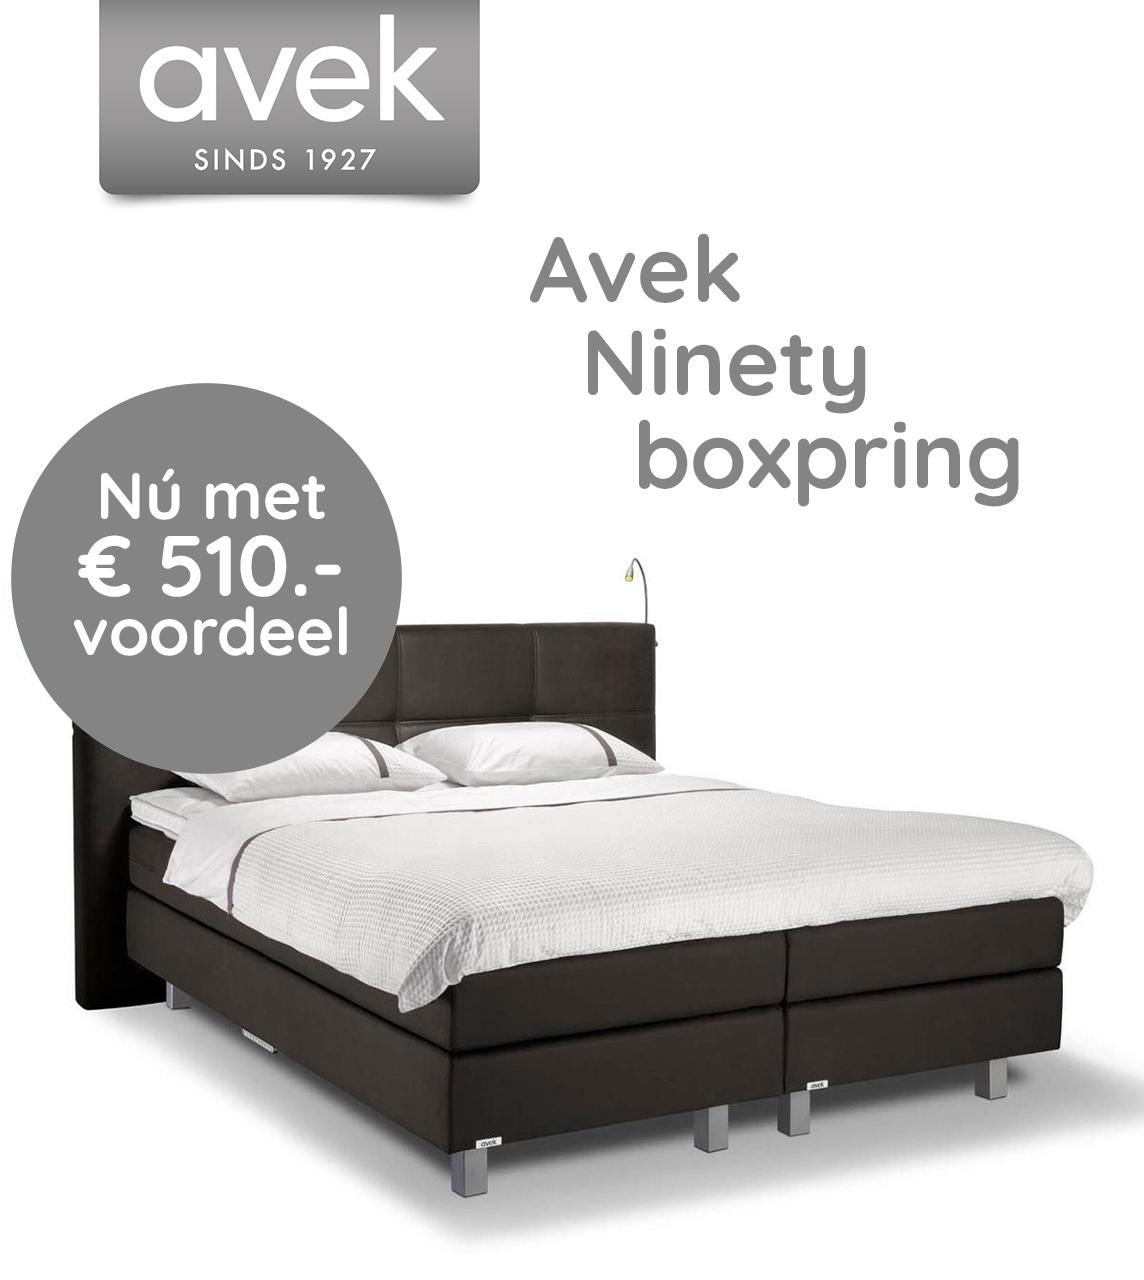 Avek Ninety Boxpring